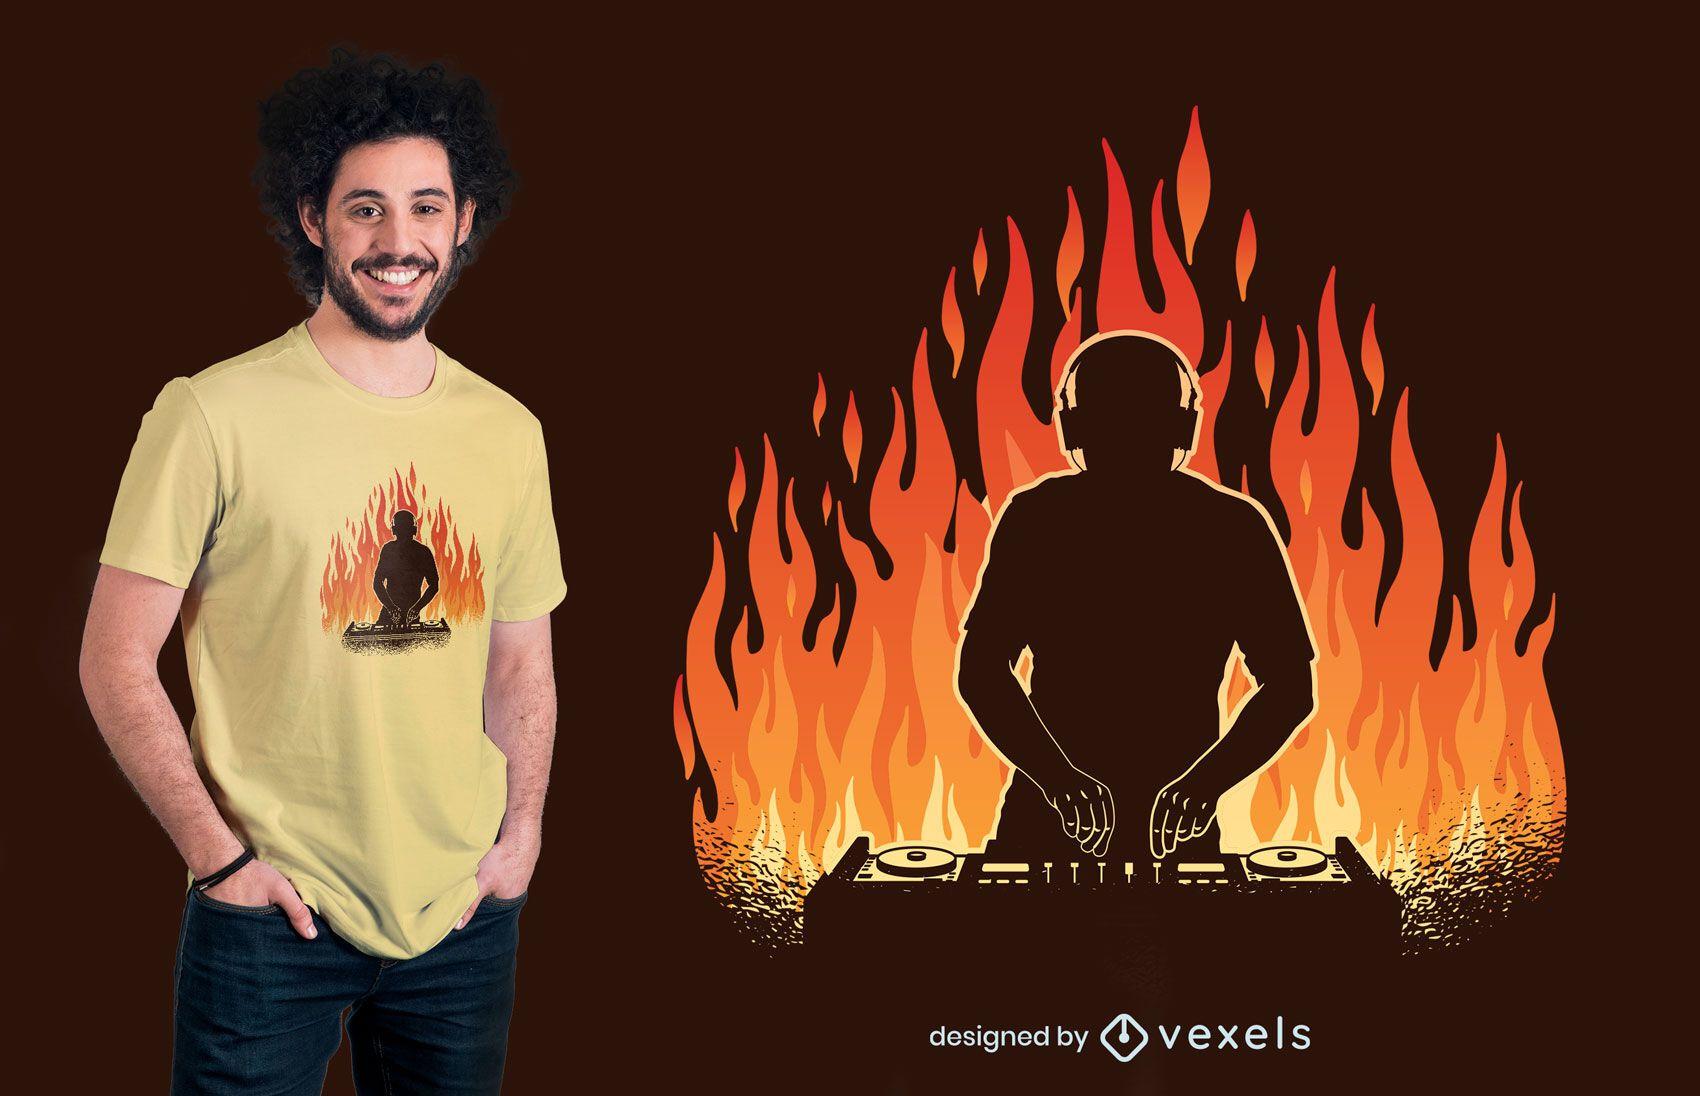 Dise?o de camiseta Dj in flames